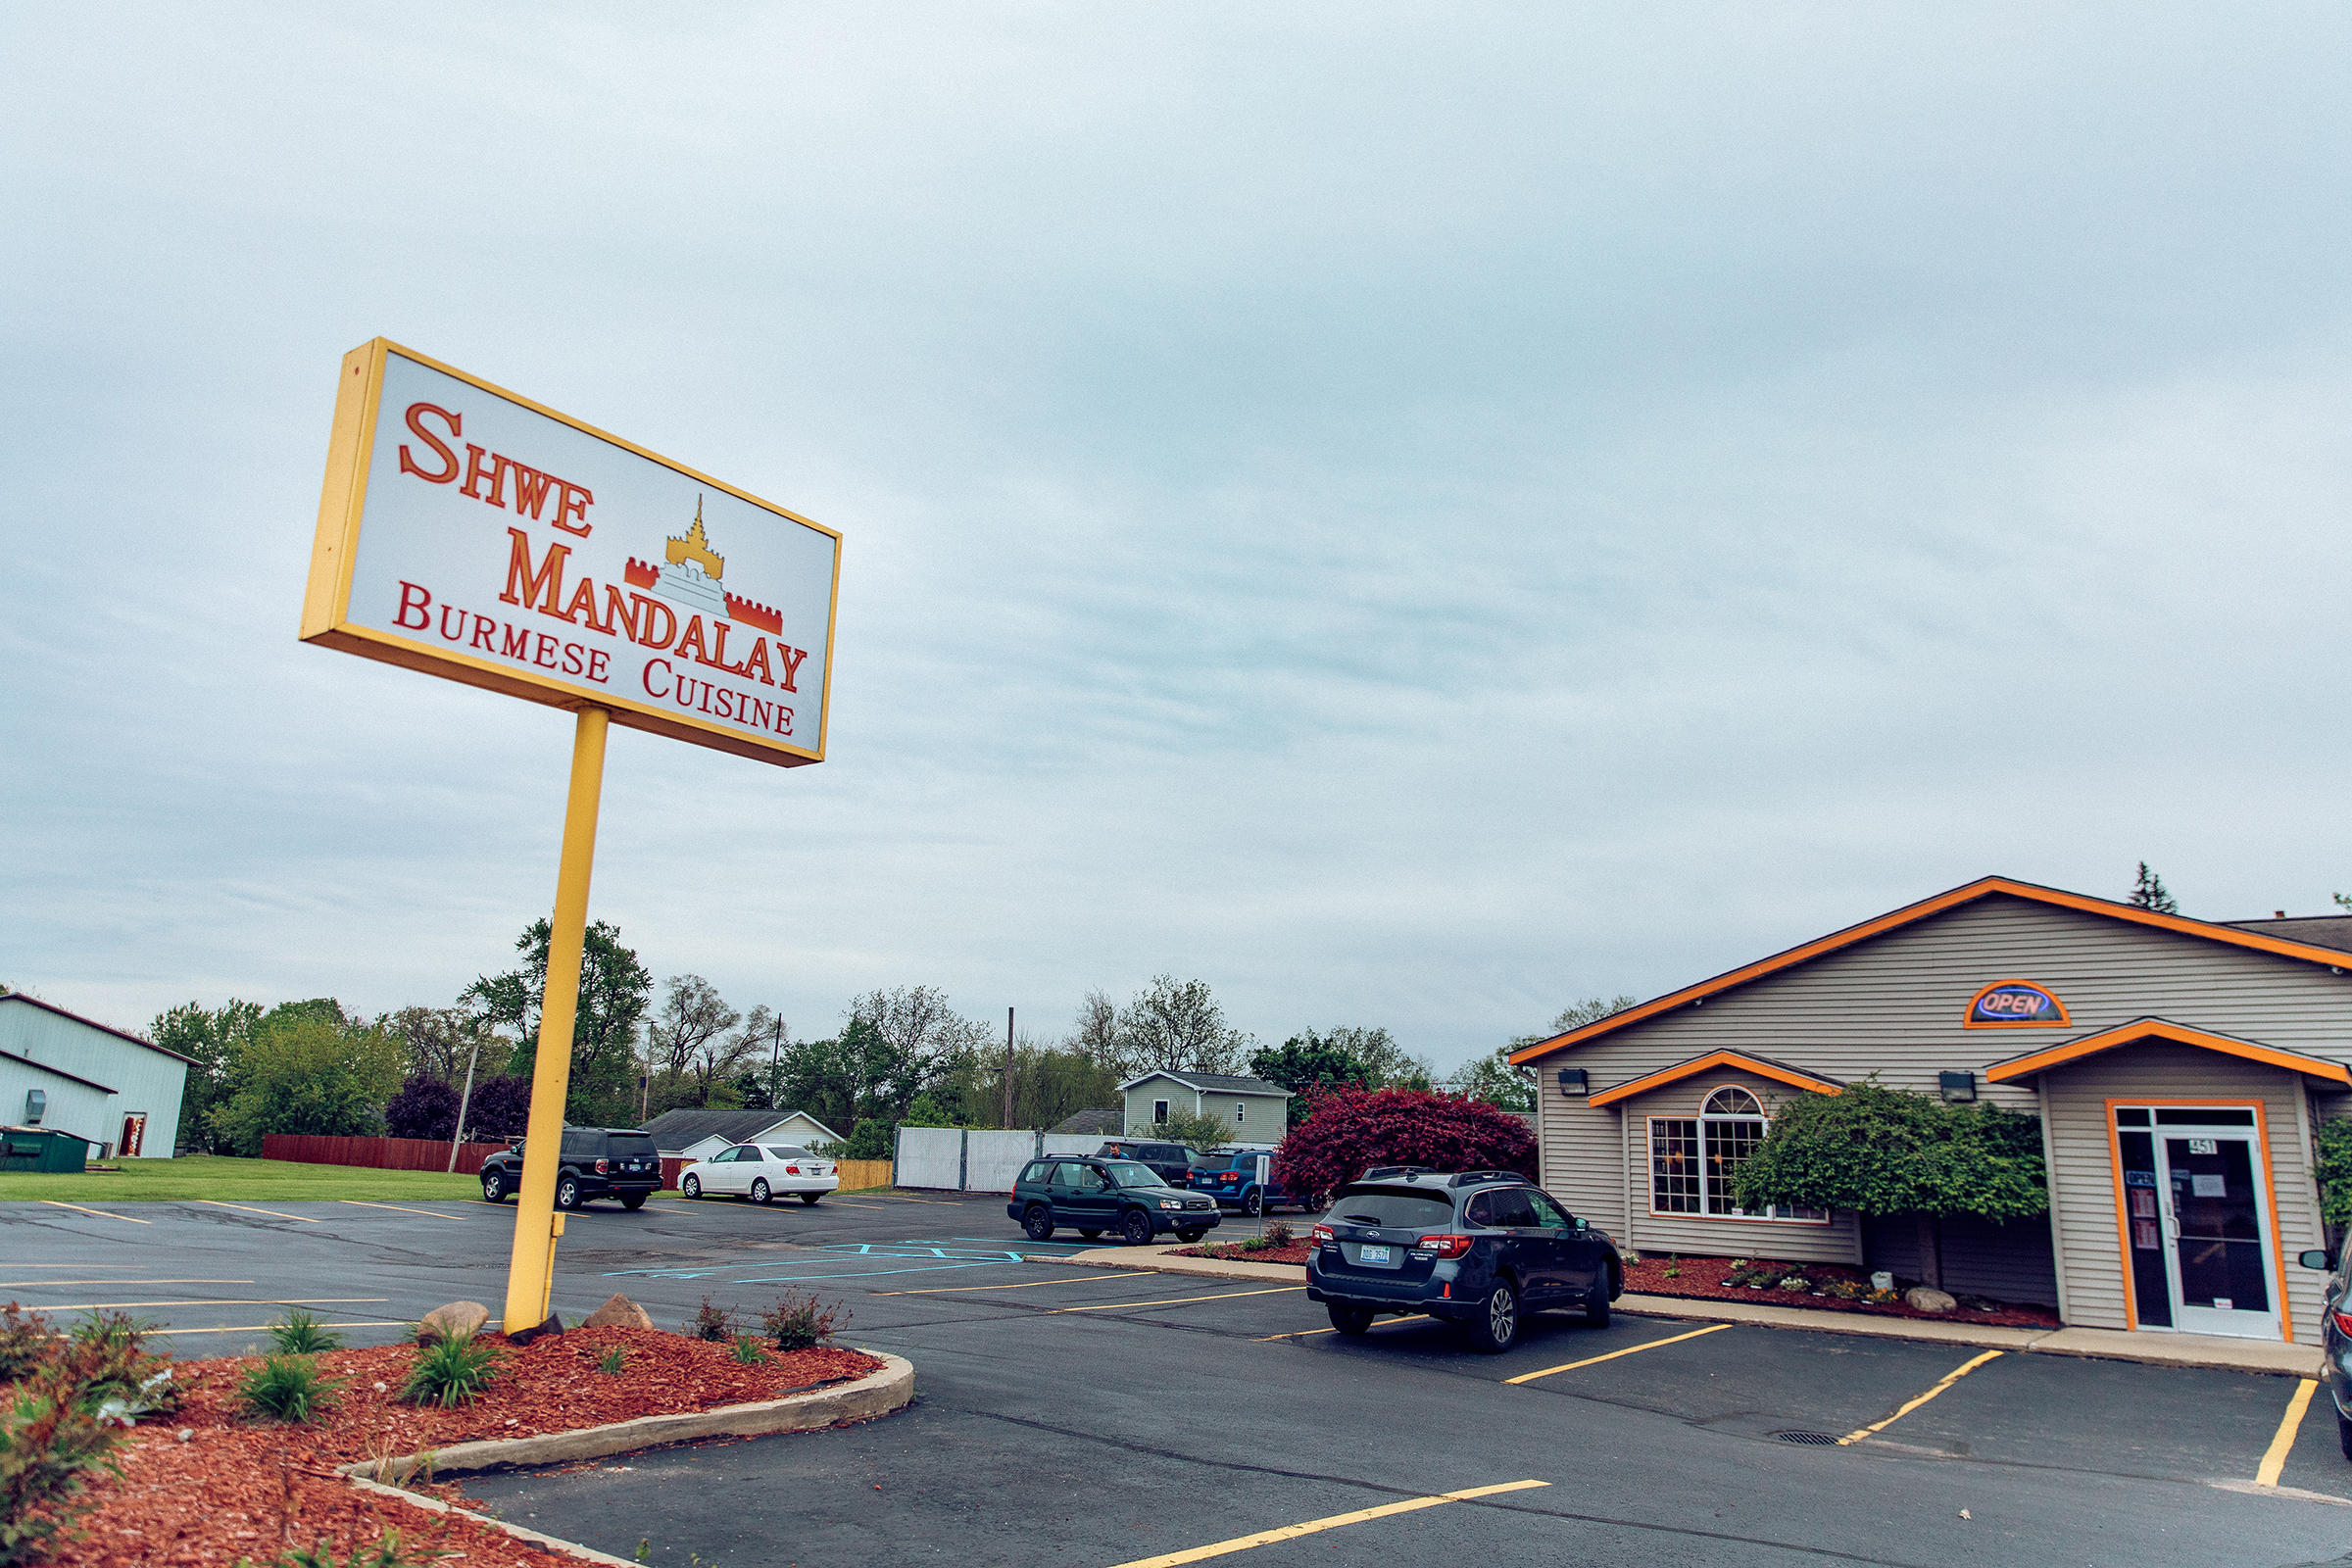 The Shwe Mandalay Burmese Cuisine restaurant in Battle Creek, Michigan.